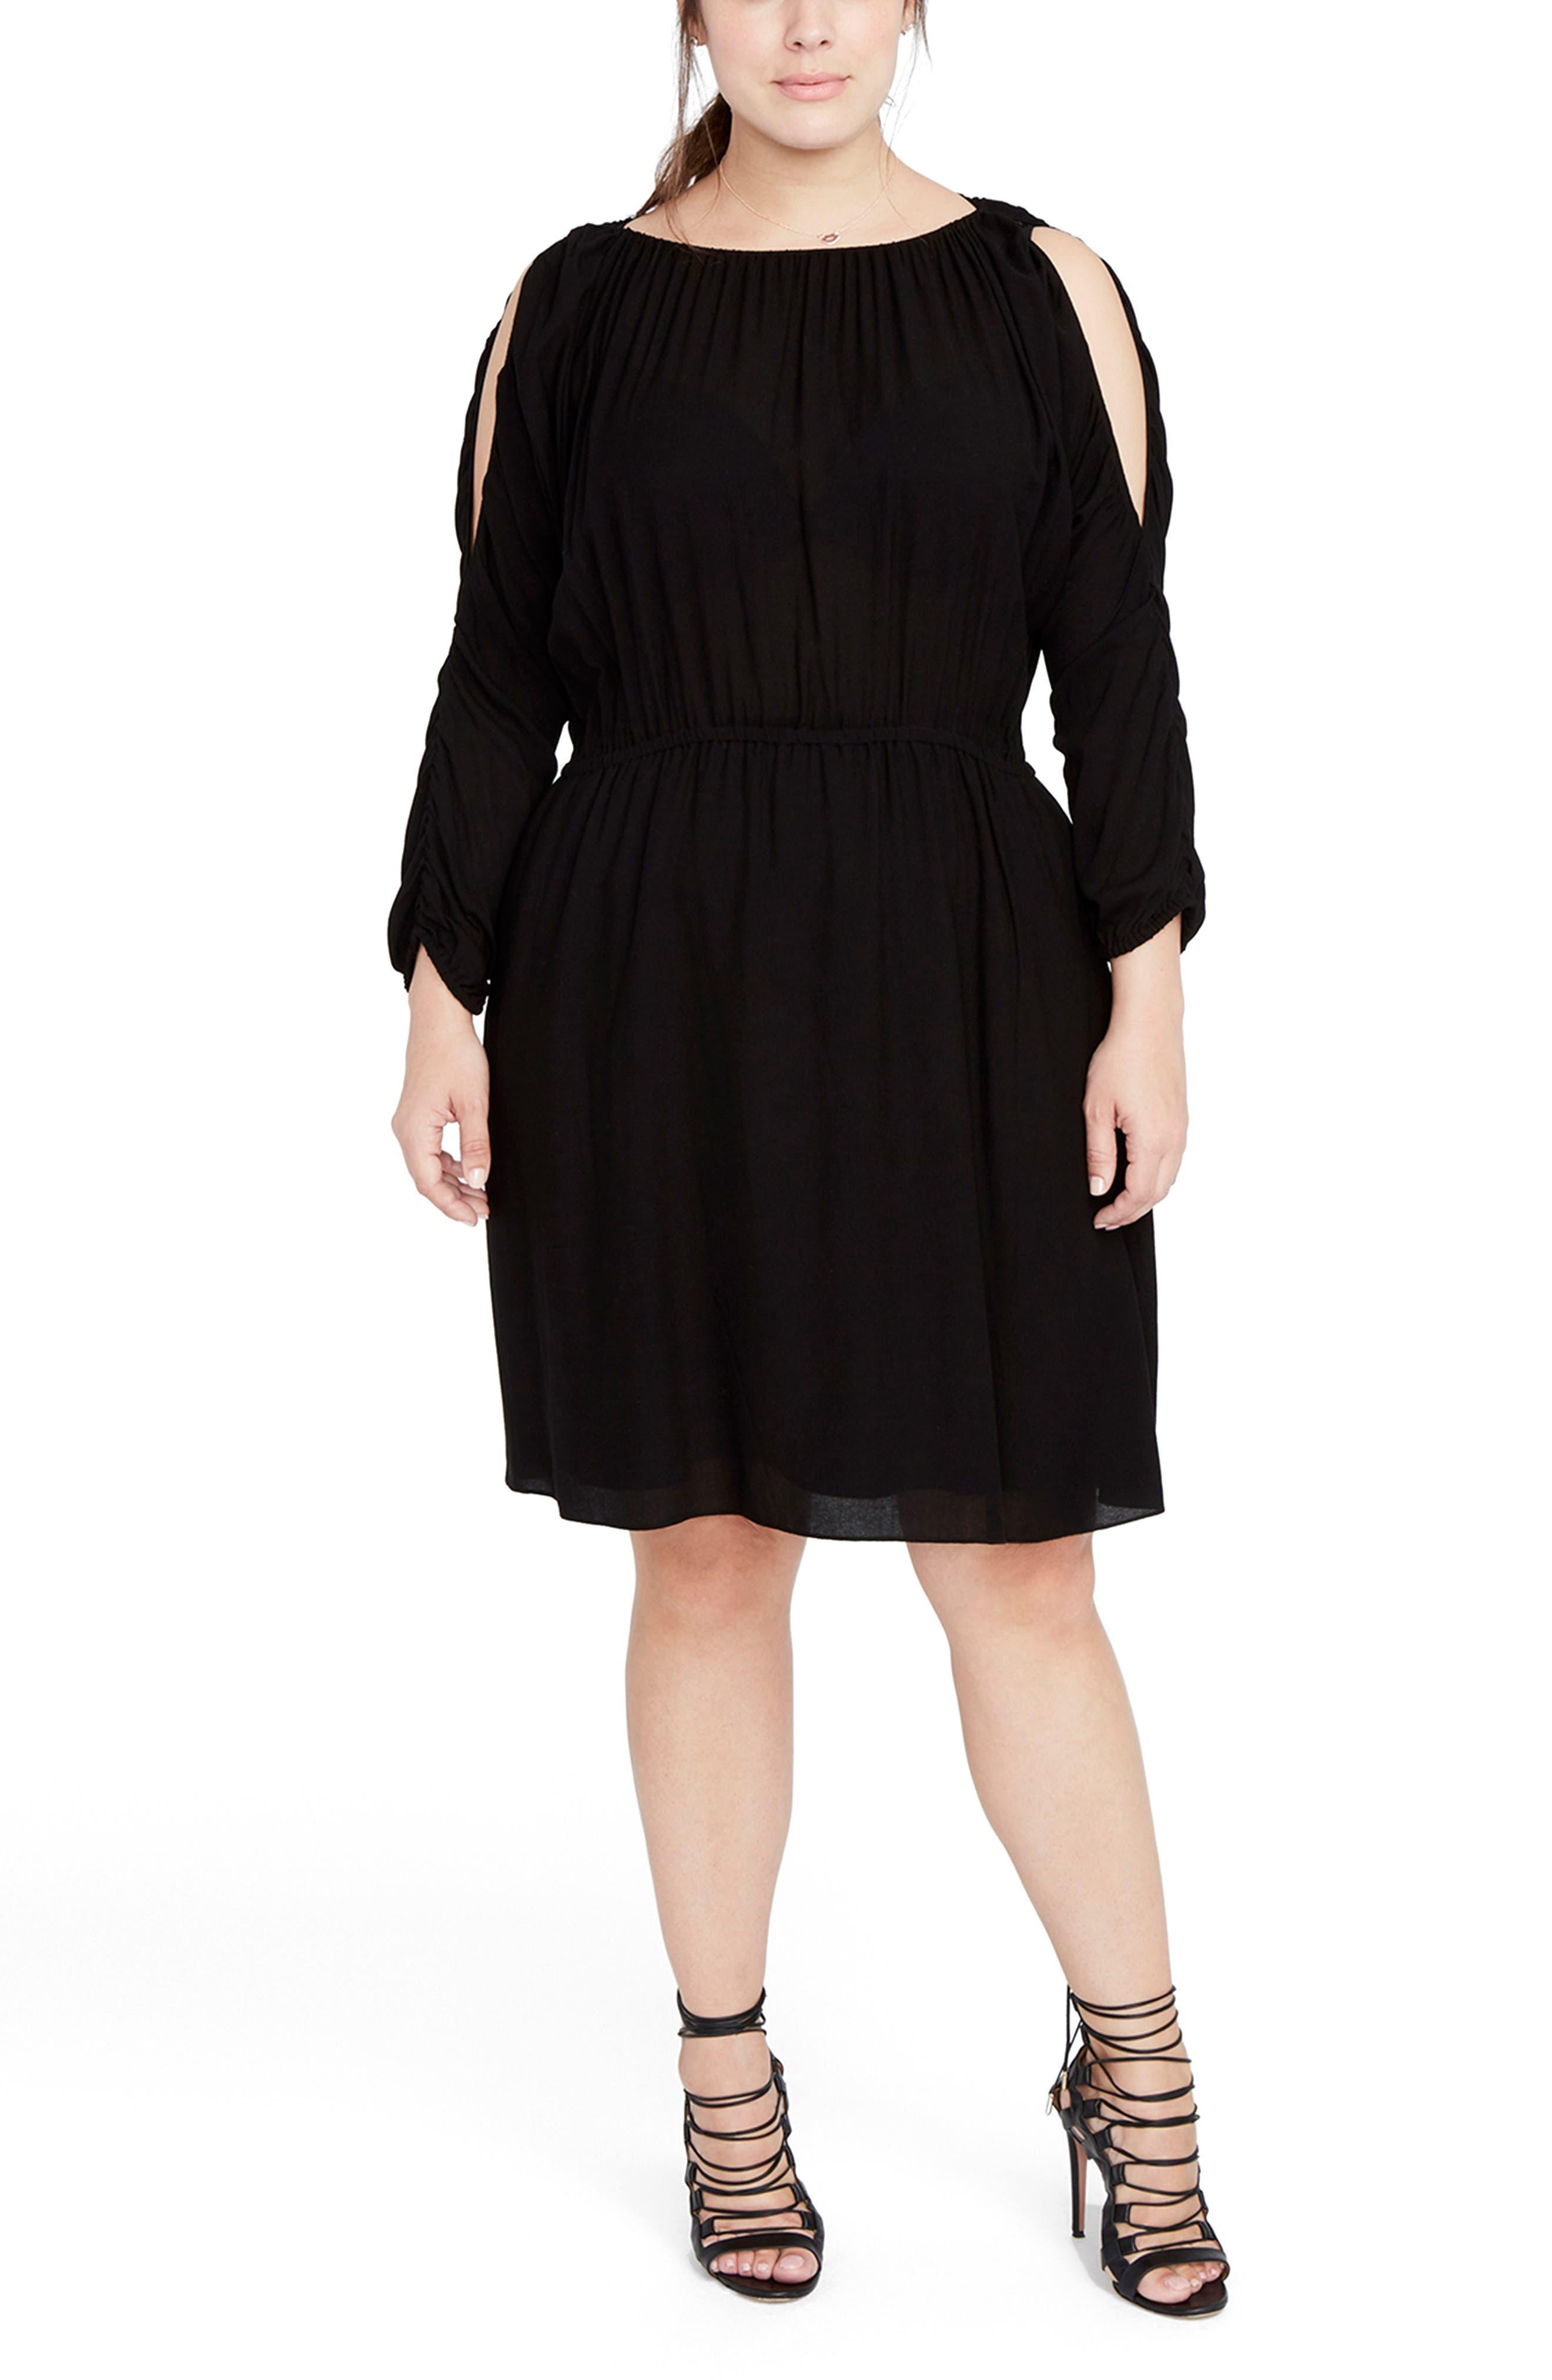 Alternate Image 1 Selected - RACHEL Rachel Roy Ruched Cold Shoulder Dress (Plus Size)